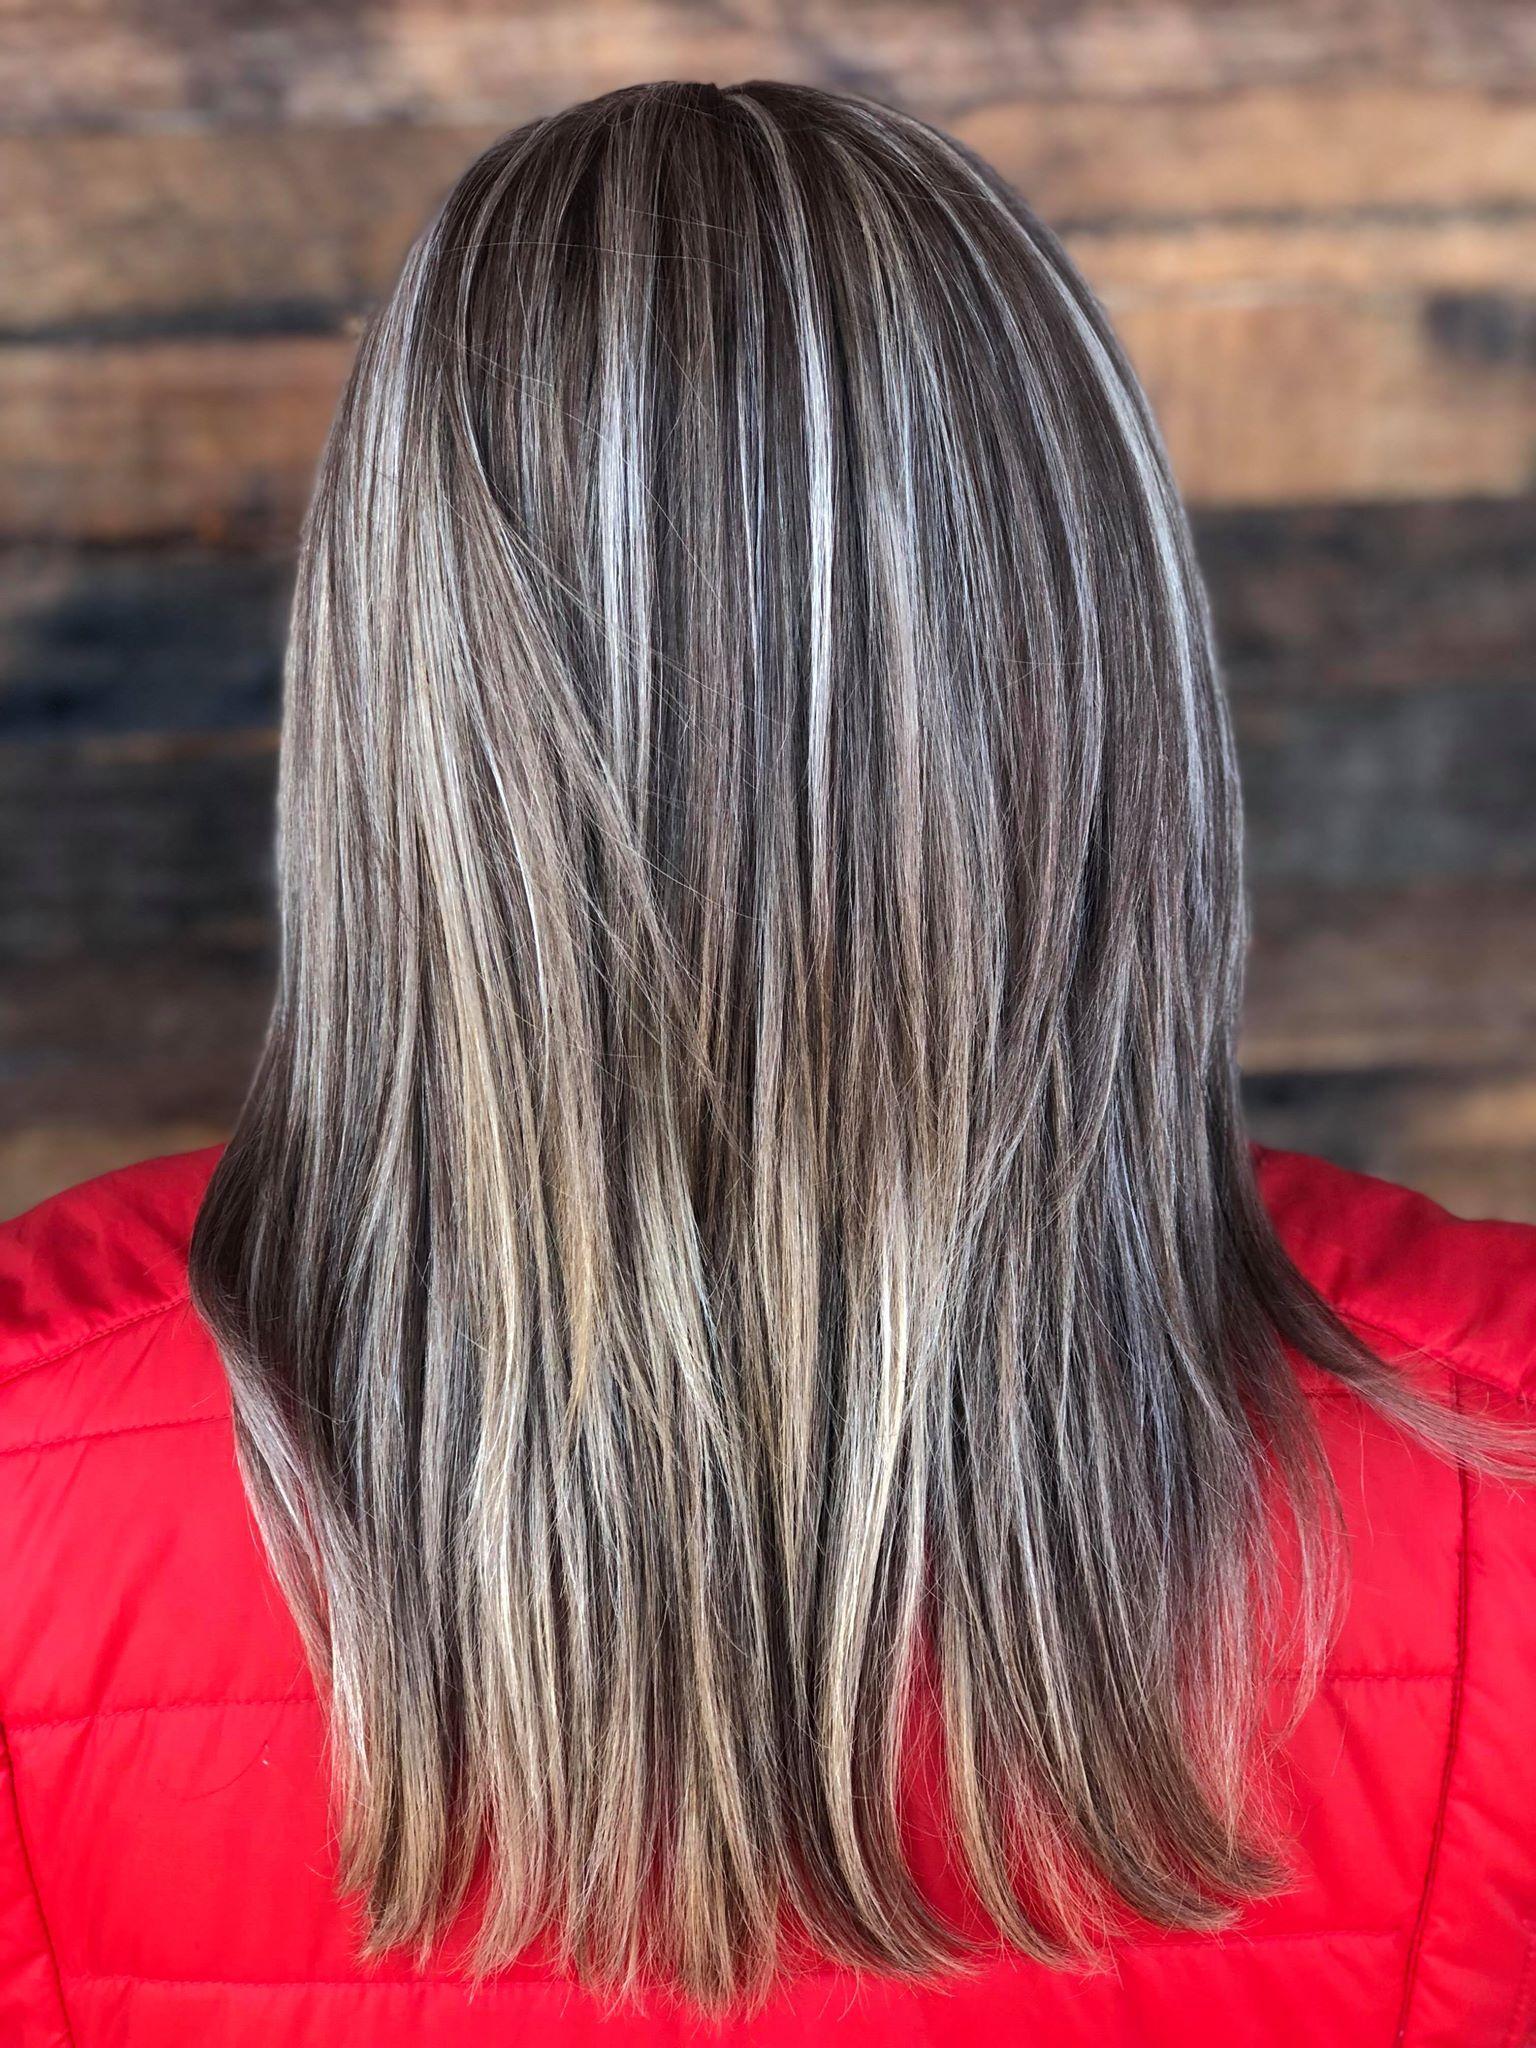 hairdresser-moolap